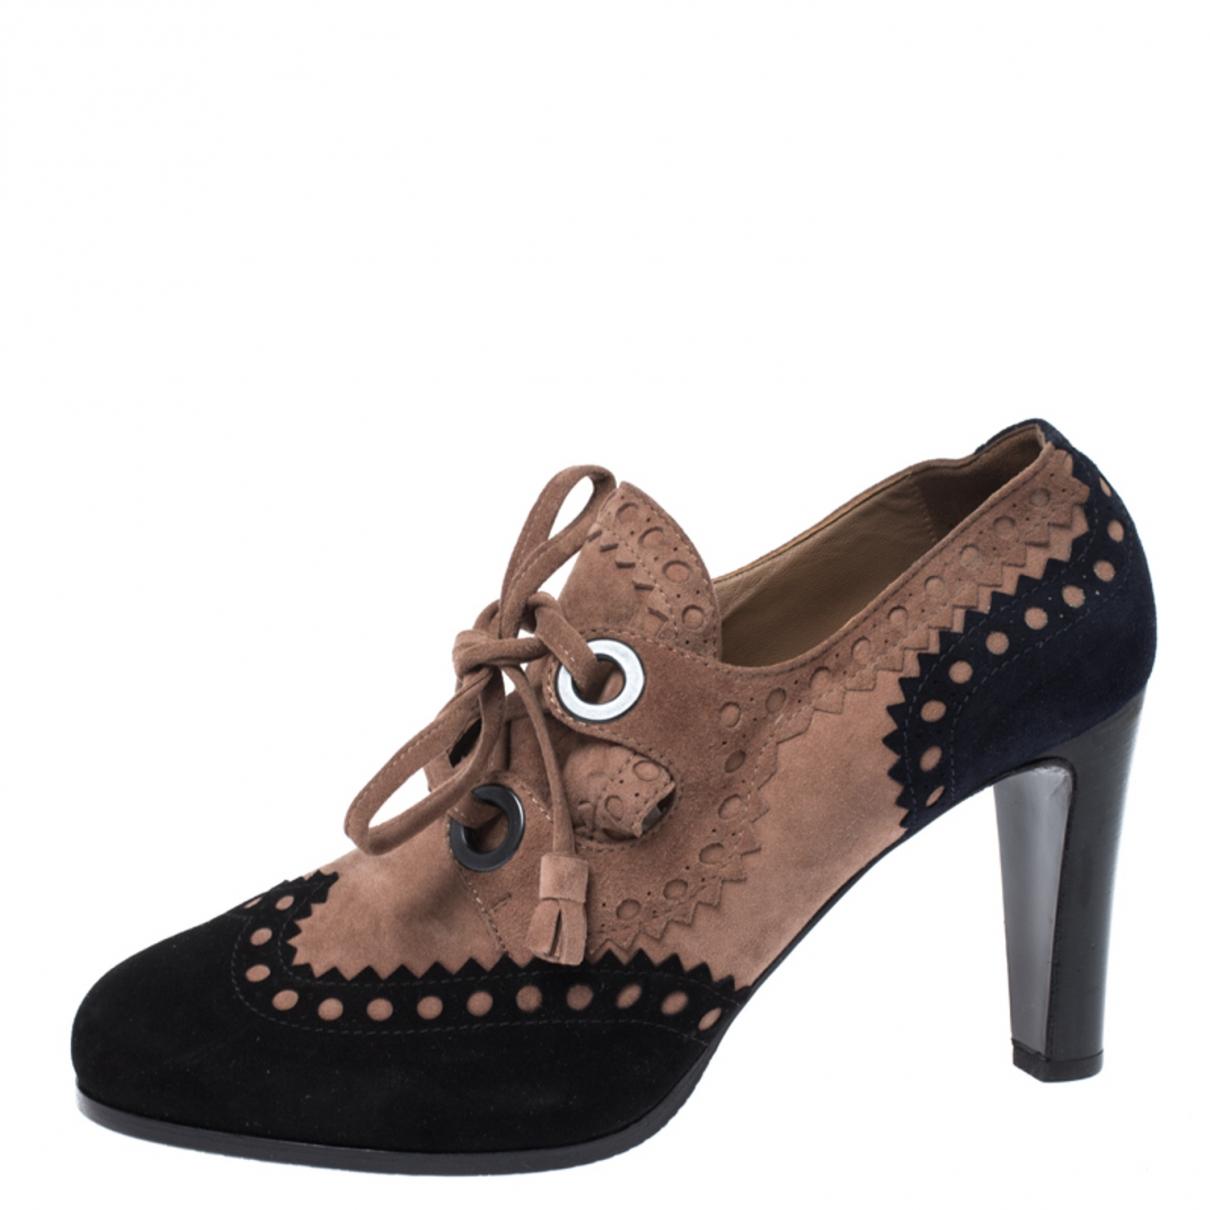 Hermès \N Multicolour Suede Ankle boots for Women 7 US